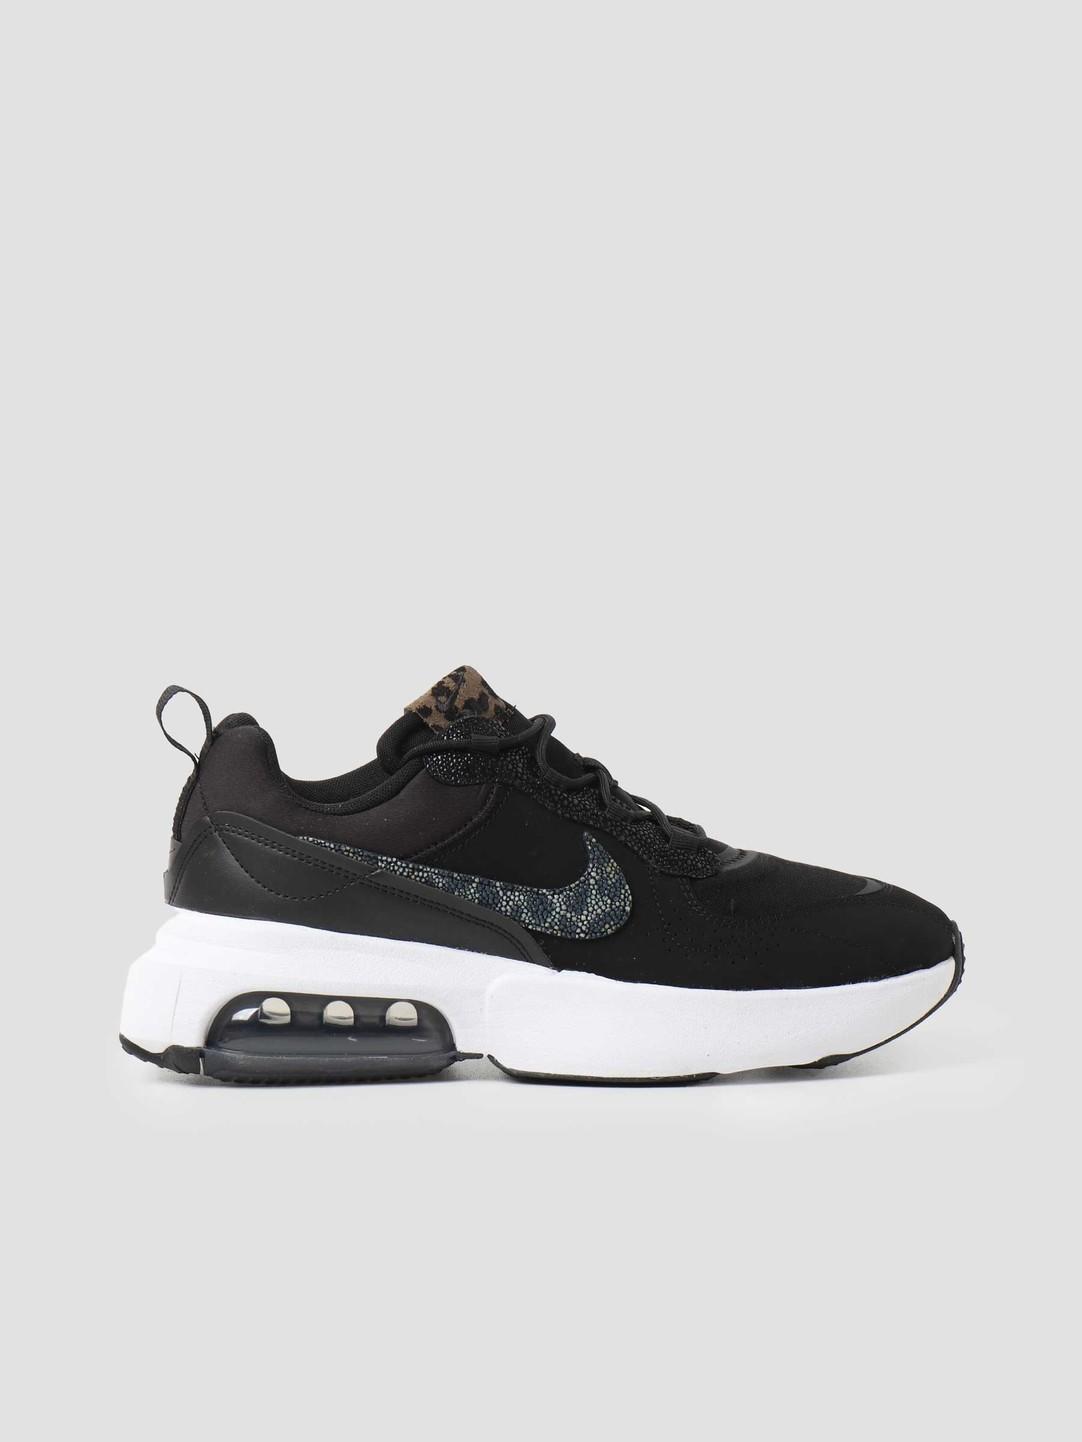 Nike Nike Air Max Verona SE Black Black-Anthracite-Off Noir